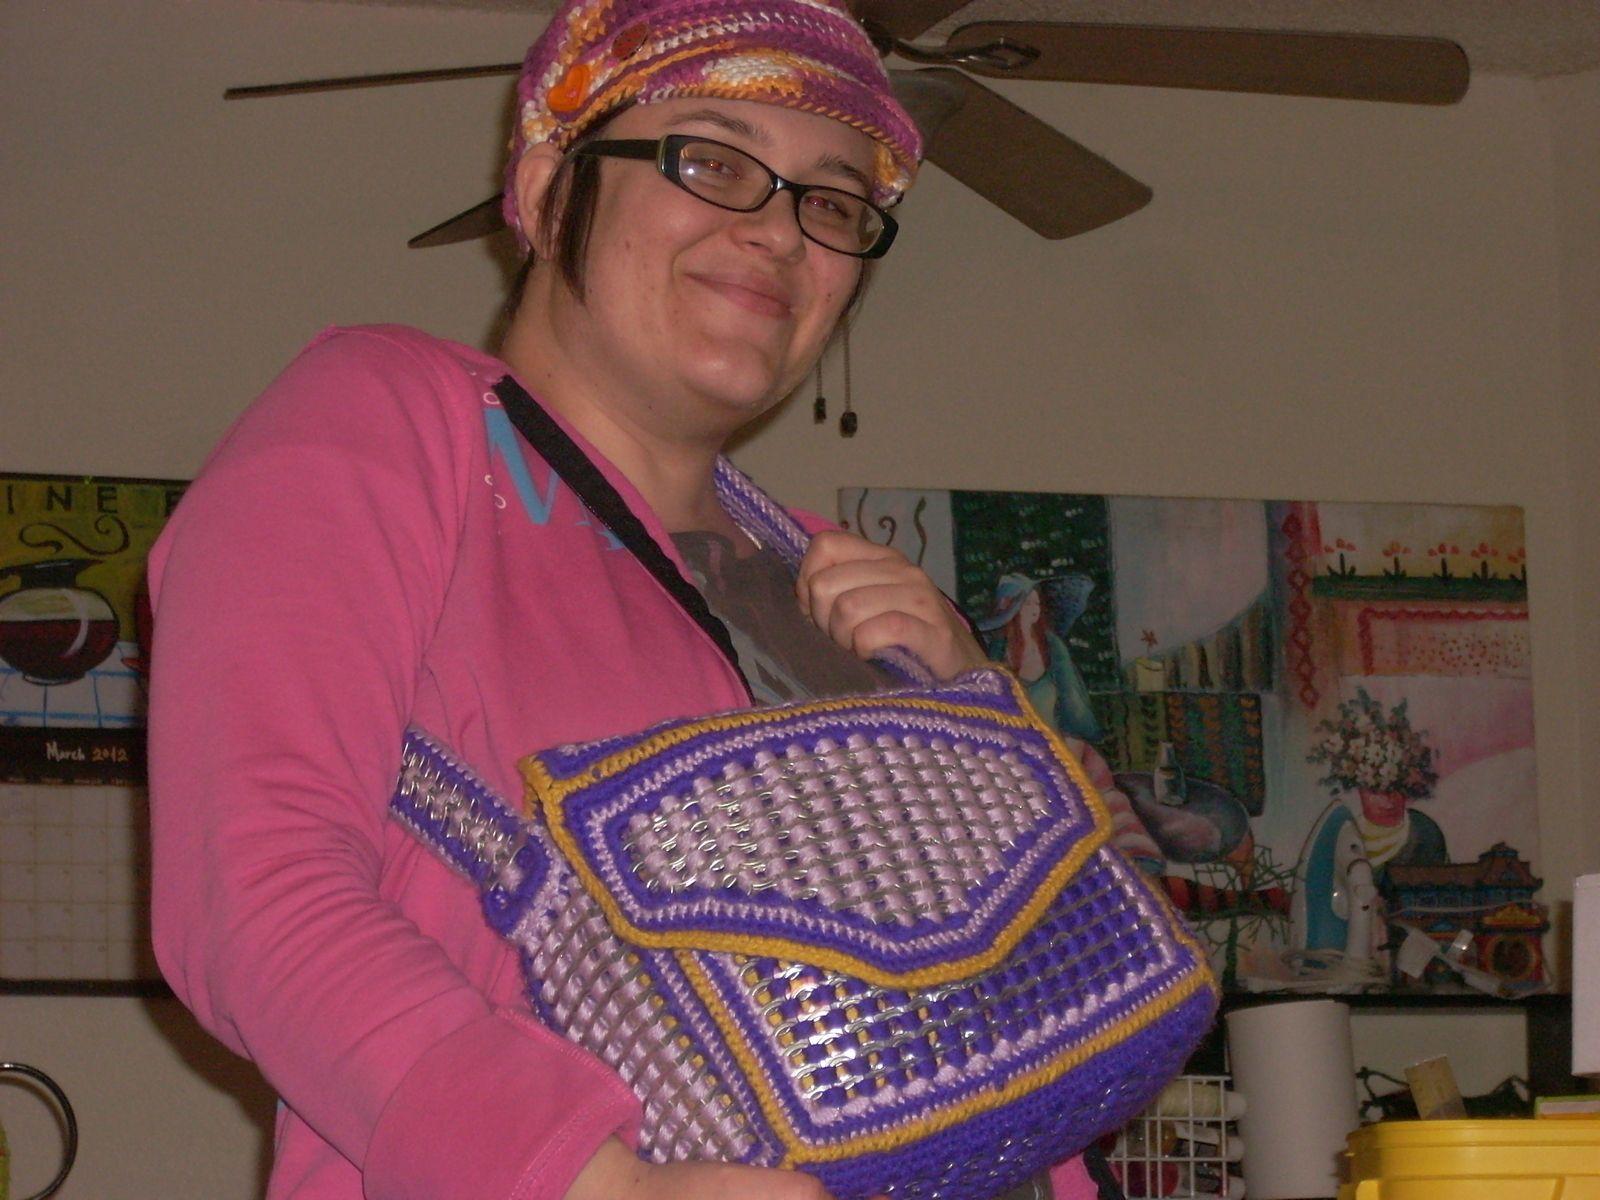 Soda pop tabs crafts - Crochet Soda Pop Tab Purse